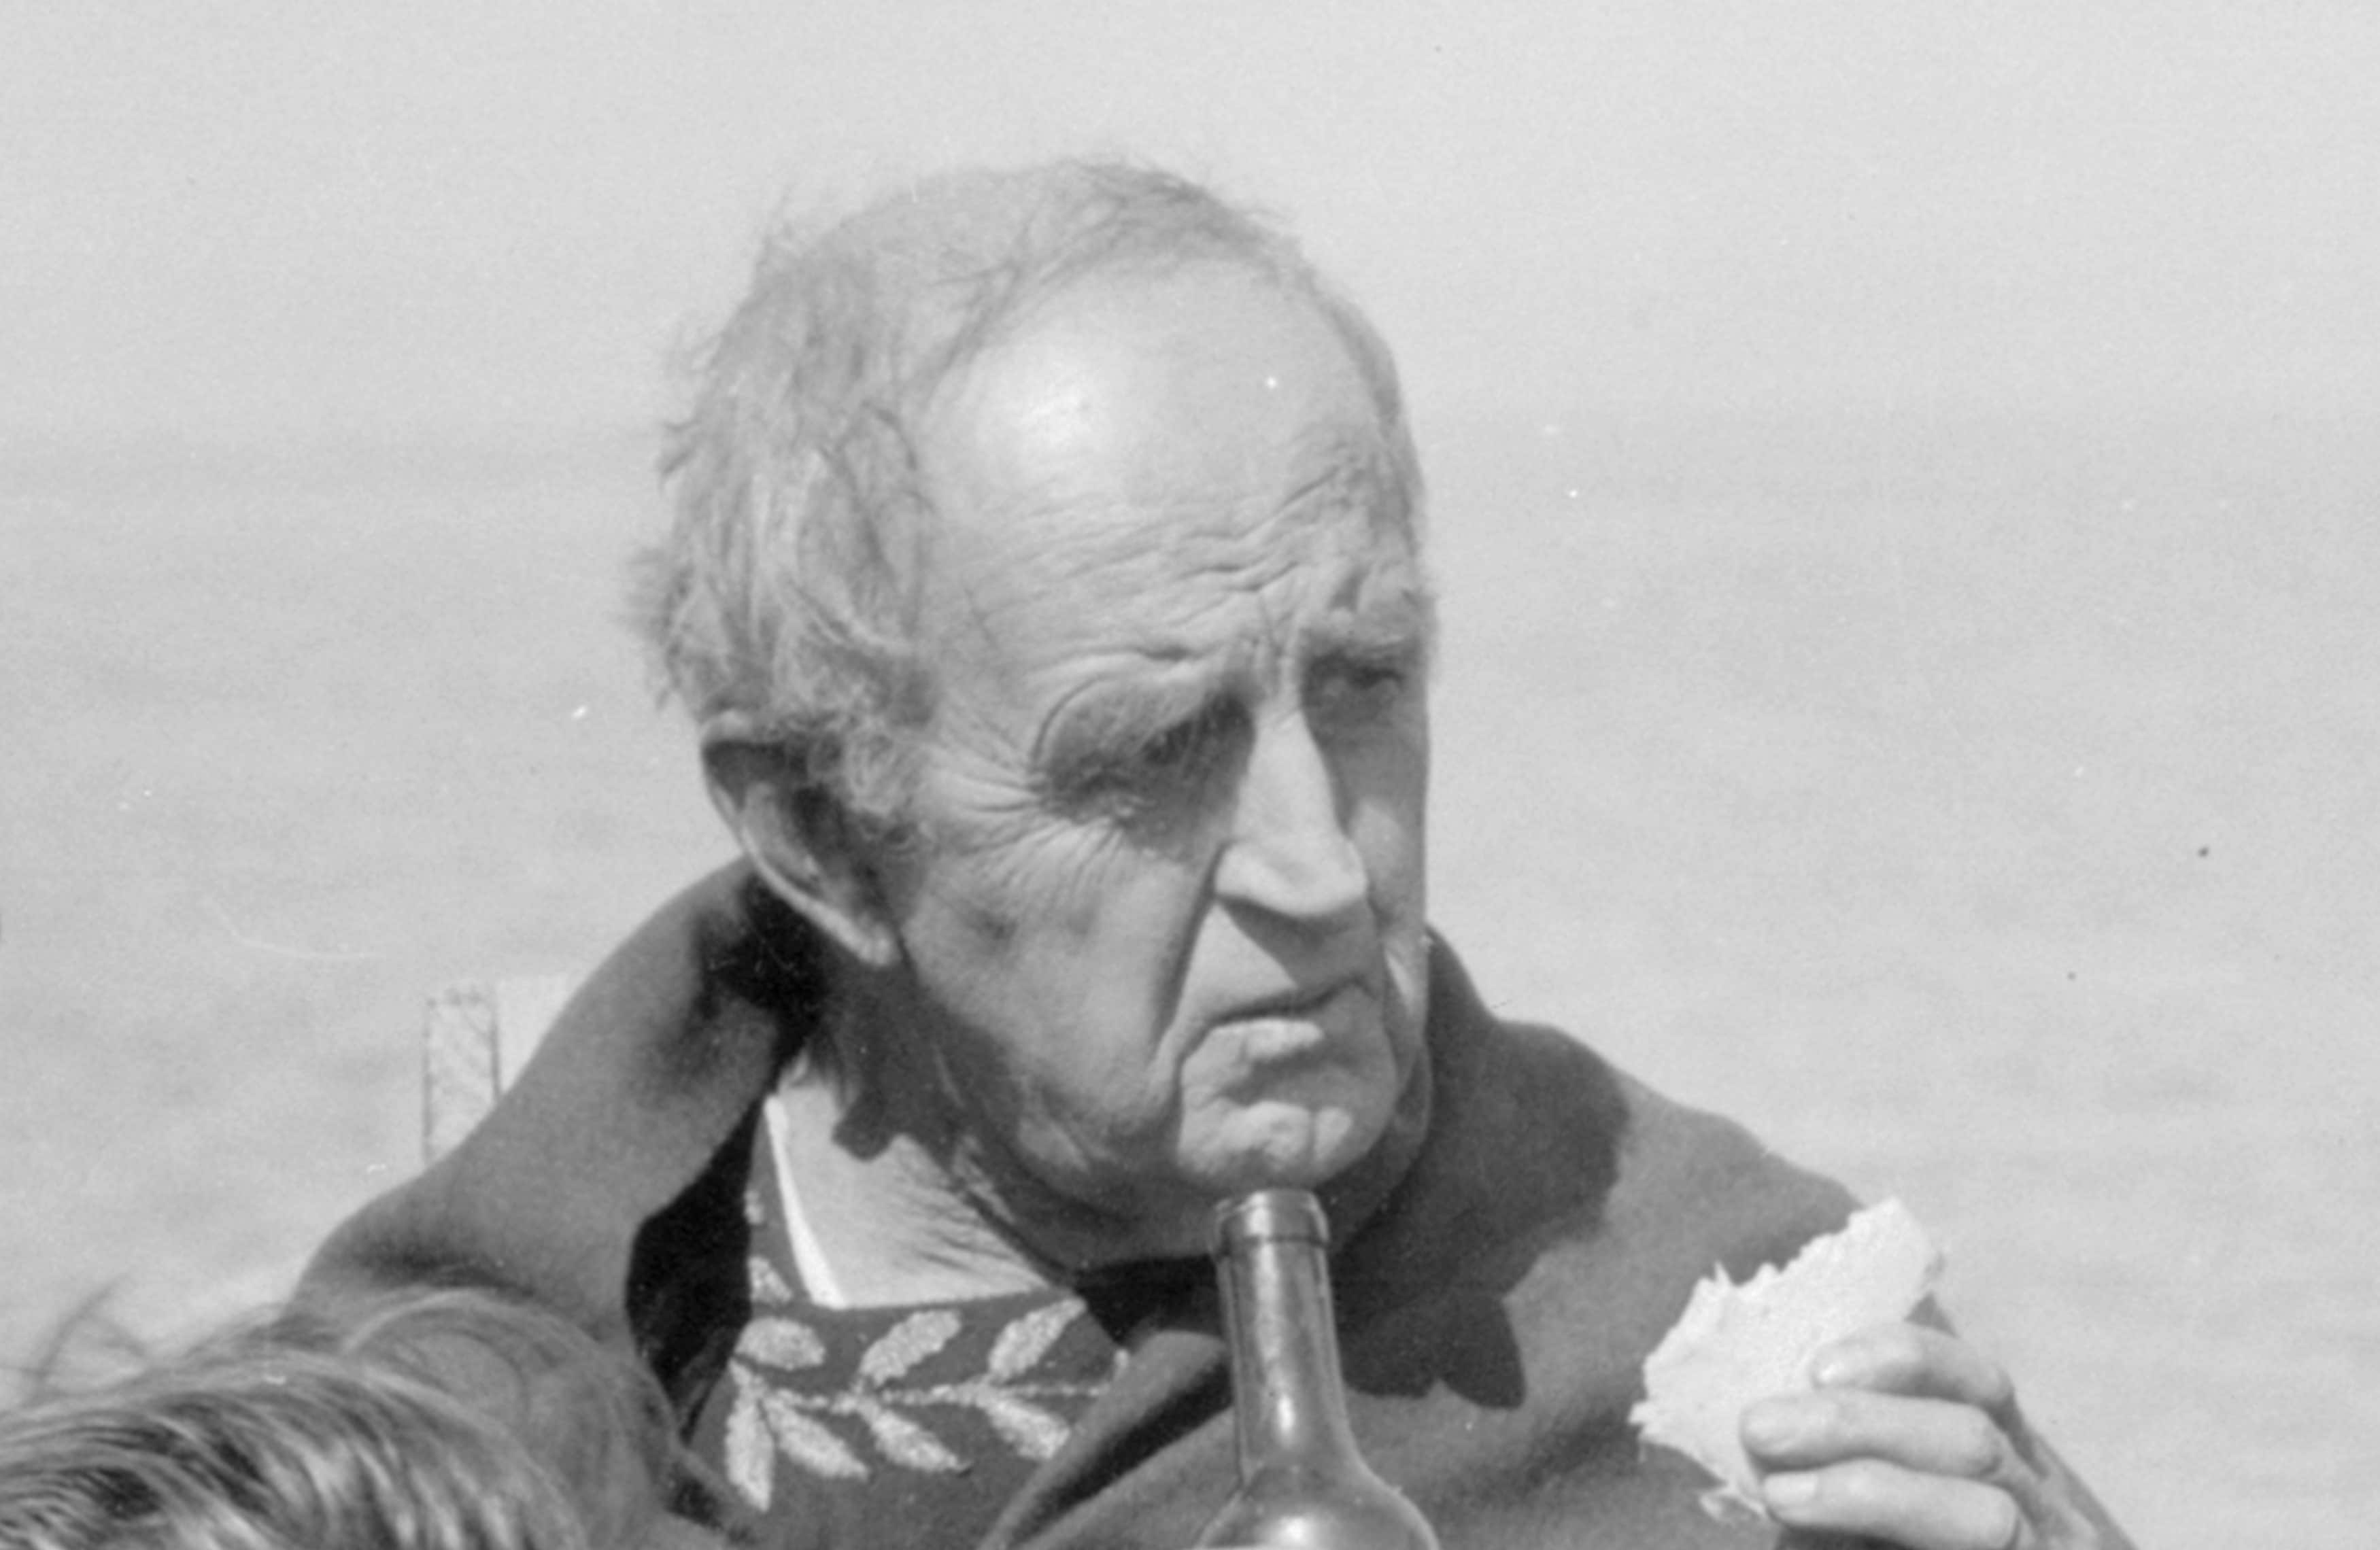 Frank Currier